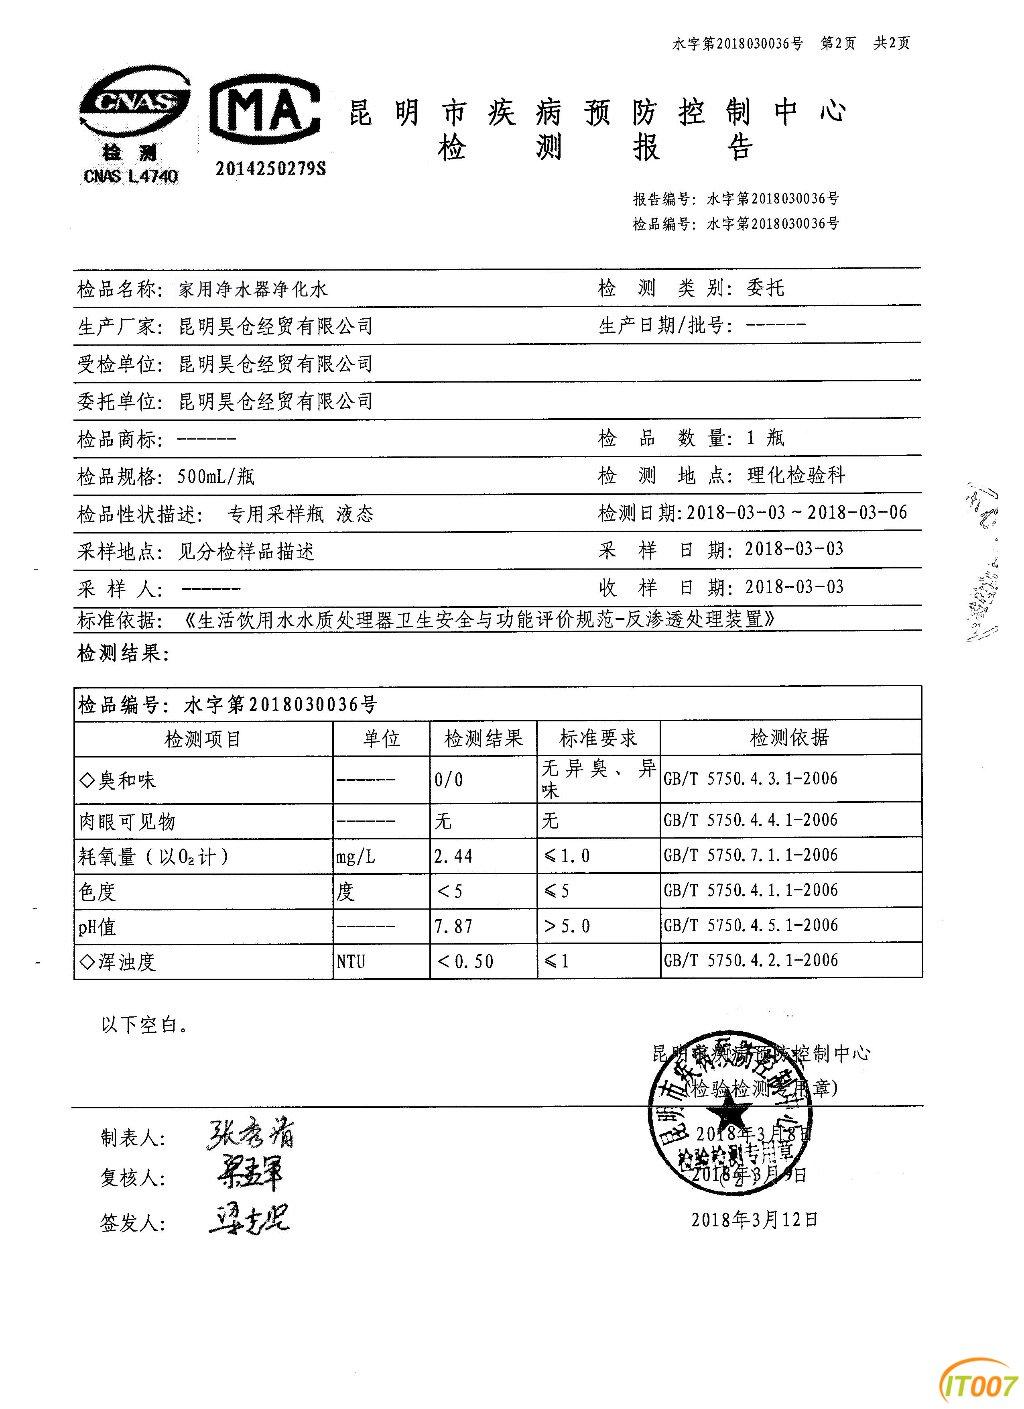 6D450ED6-33C9-4A76-9AB5-B348074301A7.jpeg